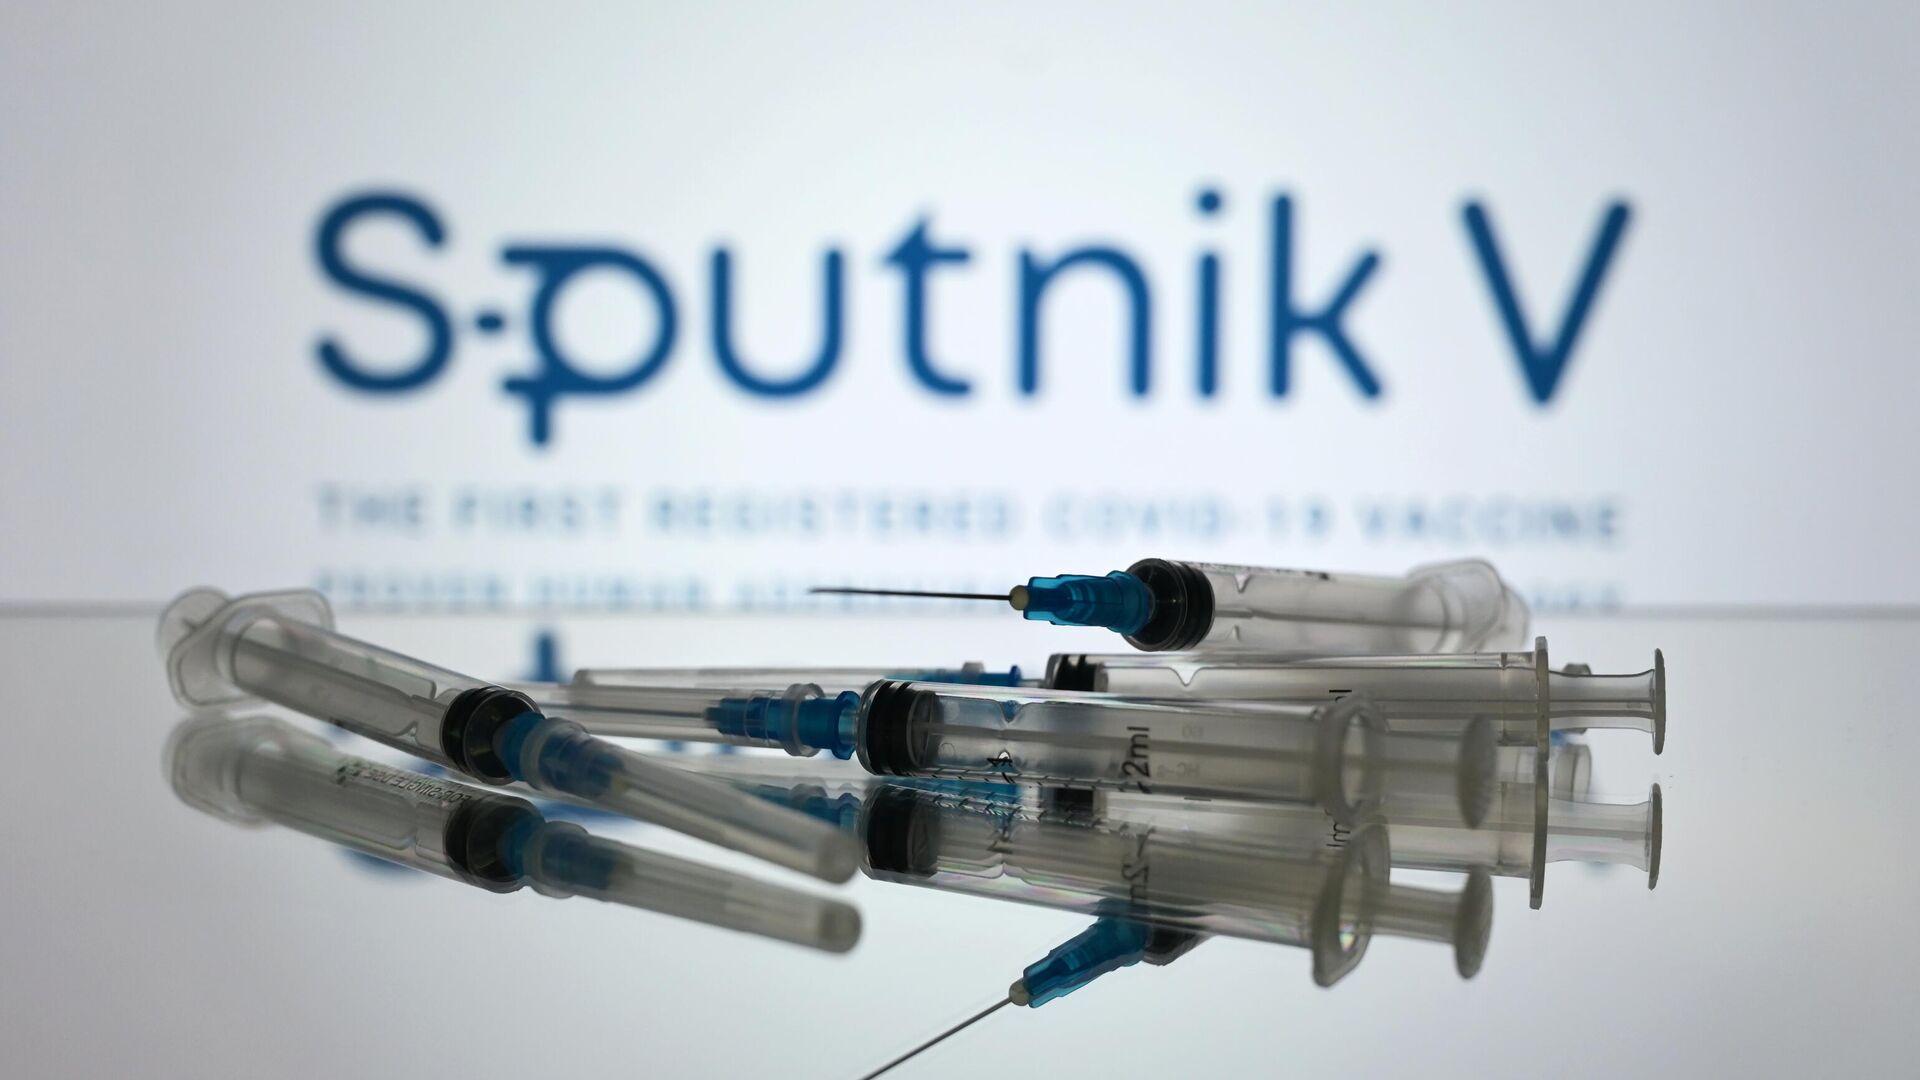 Российская вакцина против COVID-19 Спутник V (Гам-КОВИД-Вак) - РИА Новости, 1920, 14.05.2021